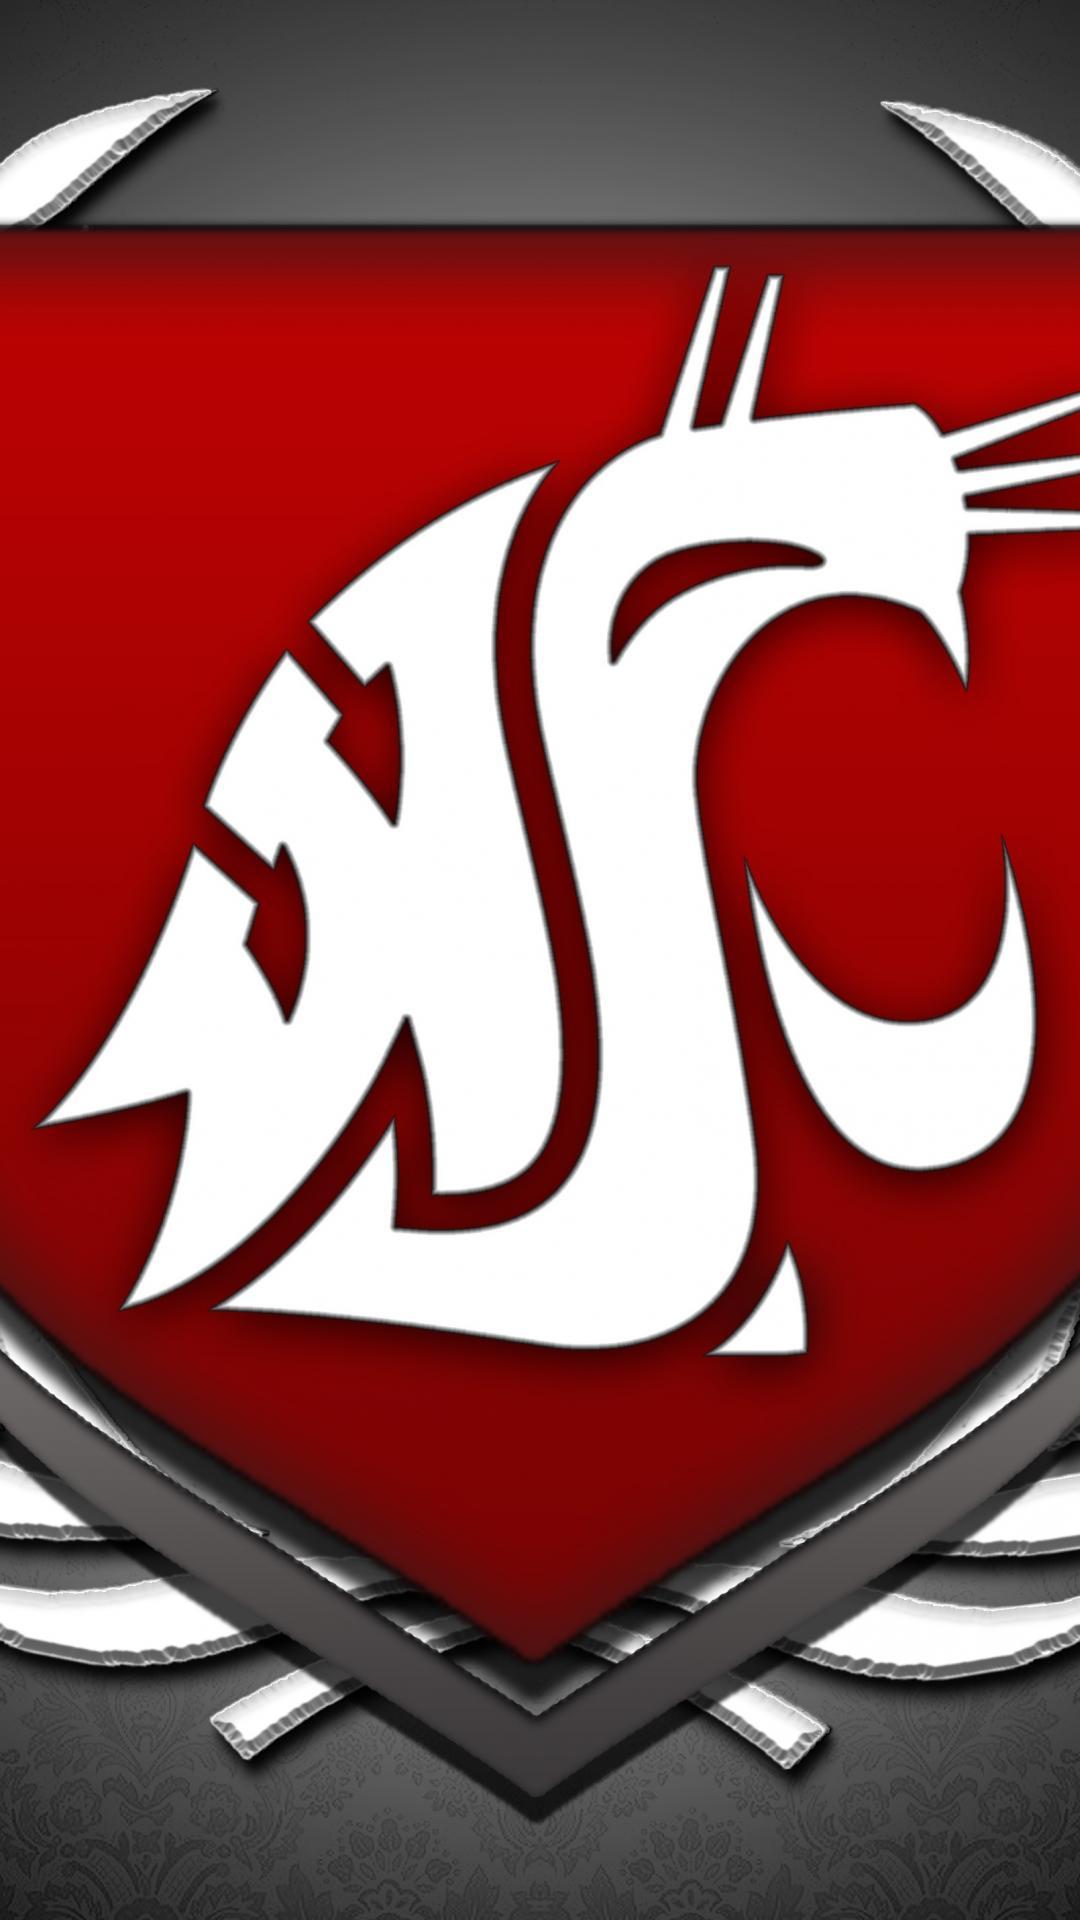 Wsu washington state university cougars wallpaper 110846 1080x1920